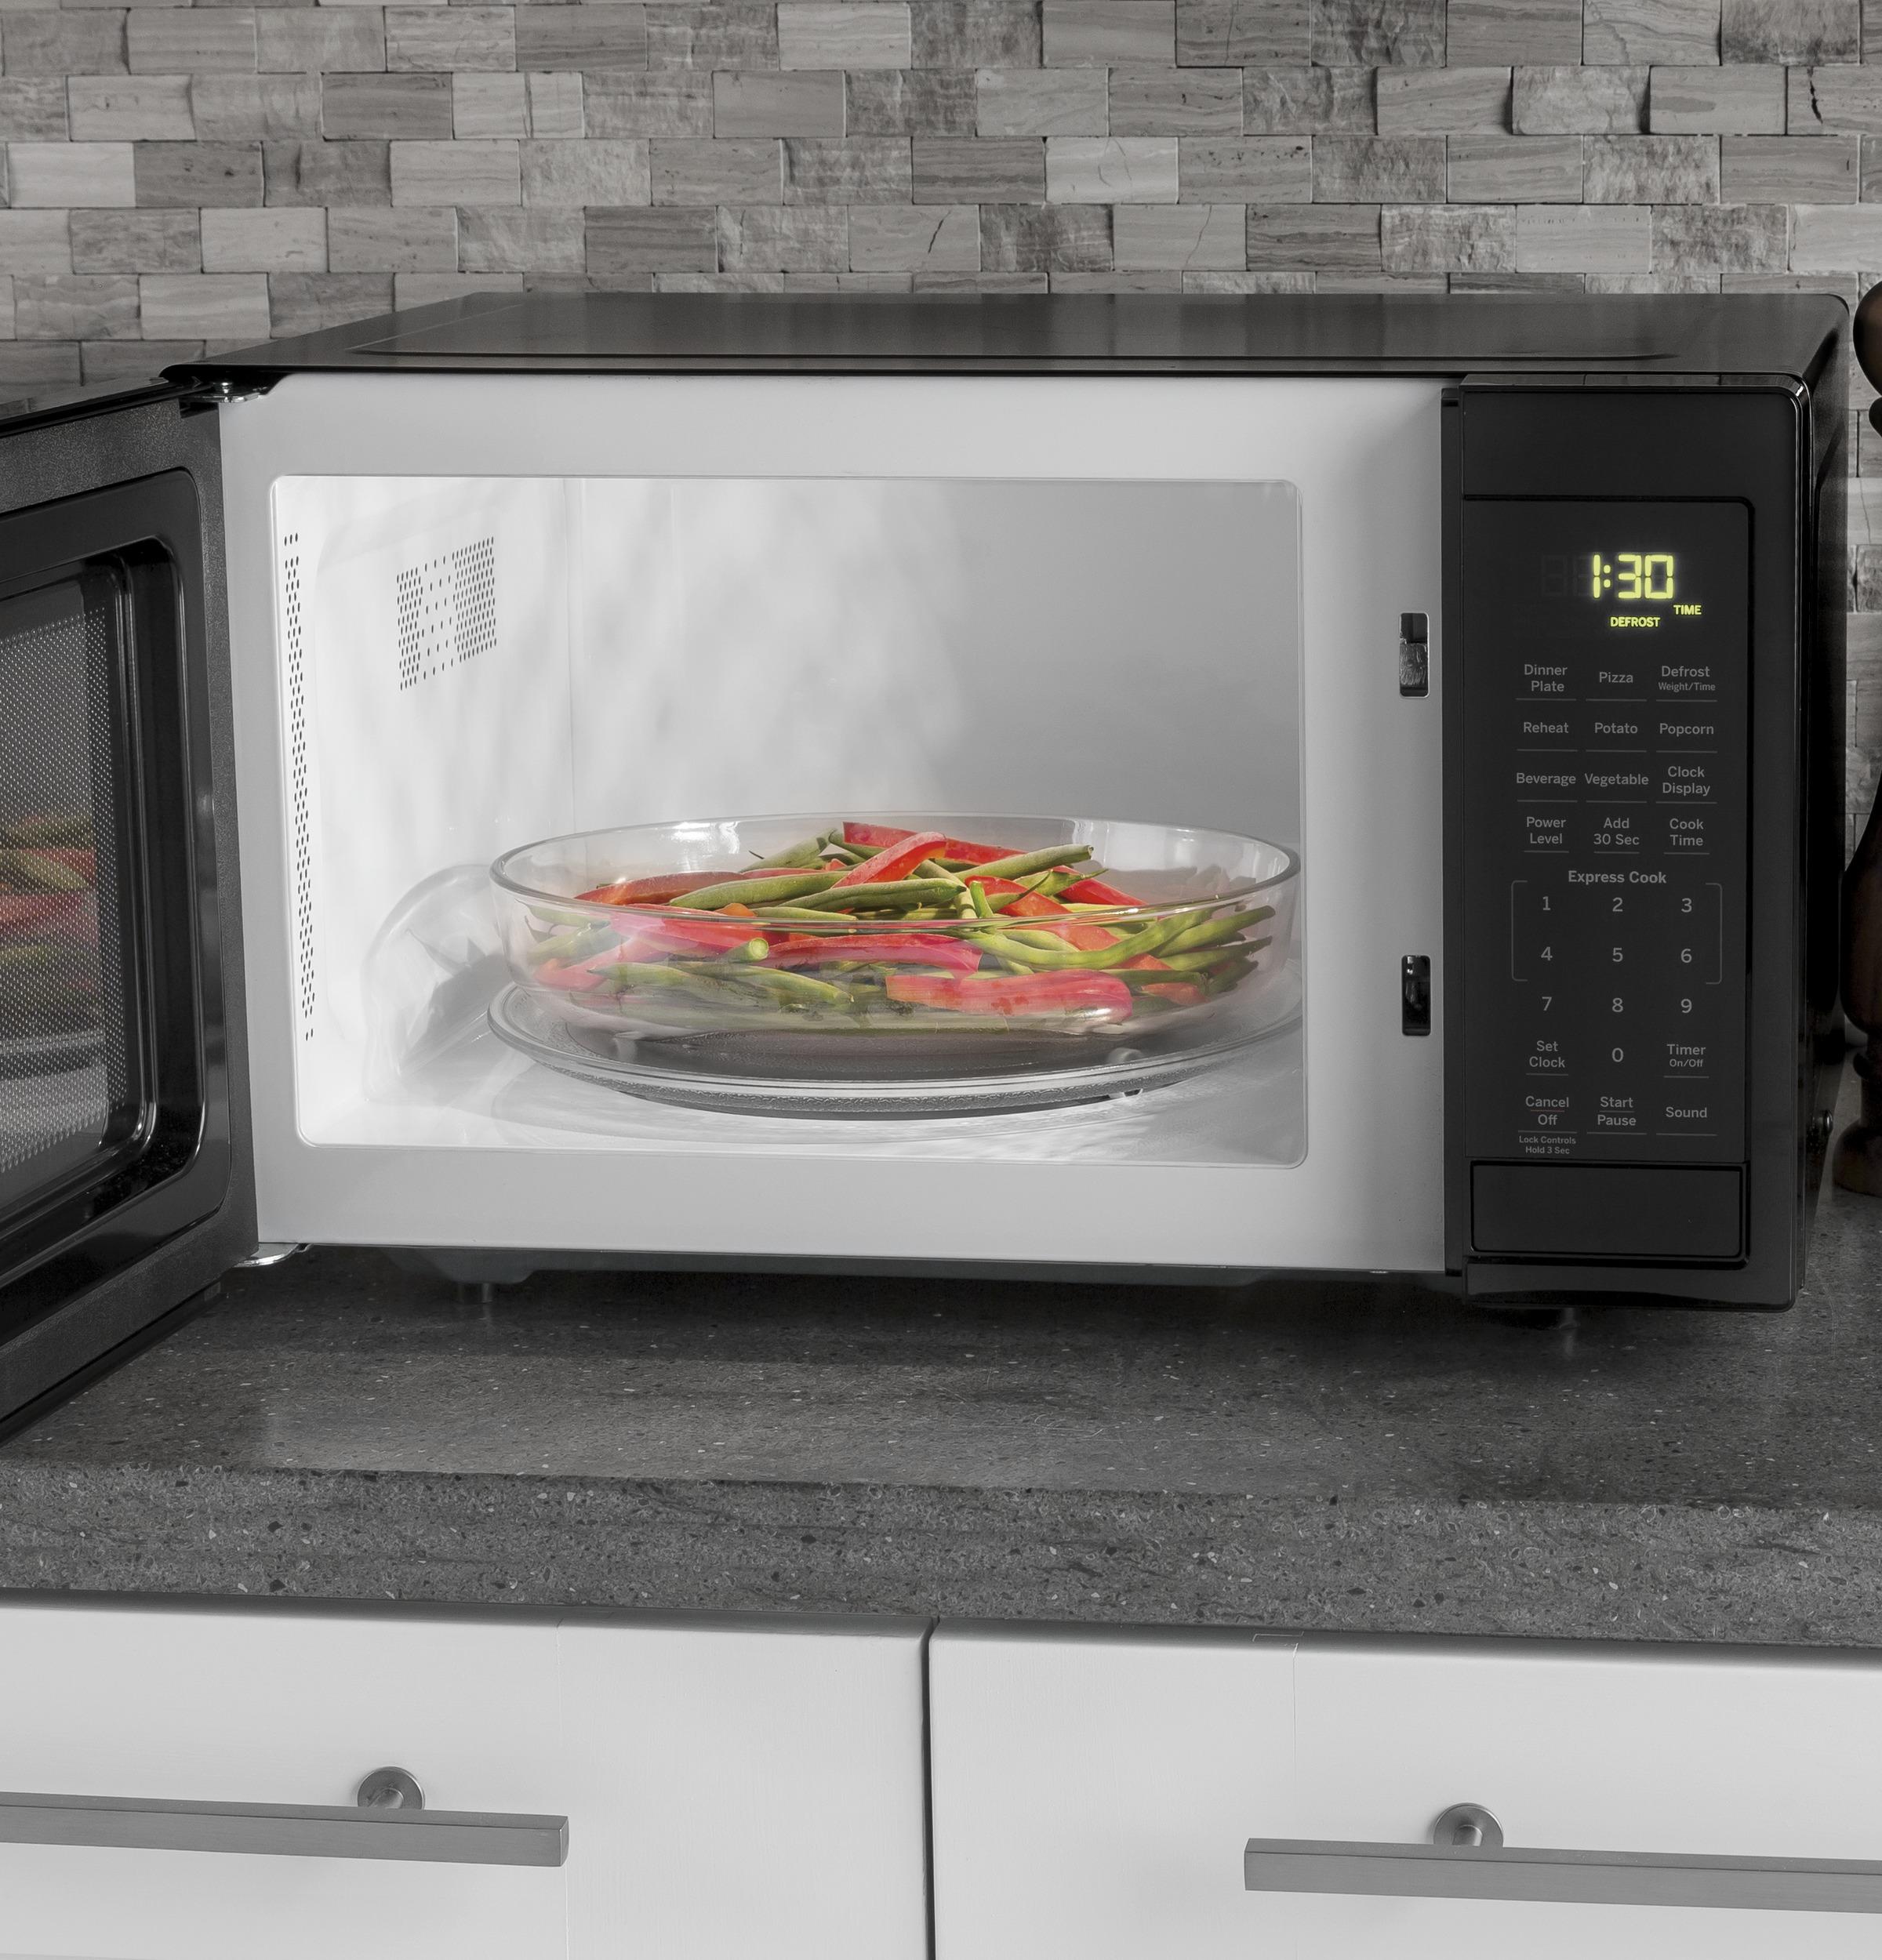 Model: JES1095DMBB | GE GE® 0.9 Cu. Ft. Capacity Countertop Microwave Oven